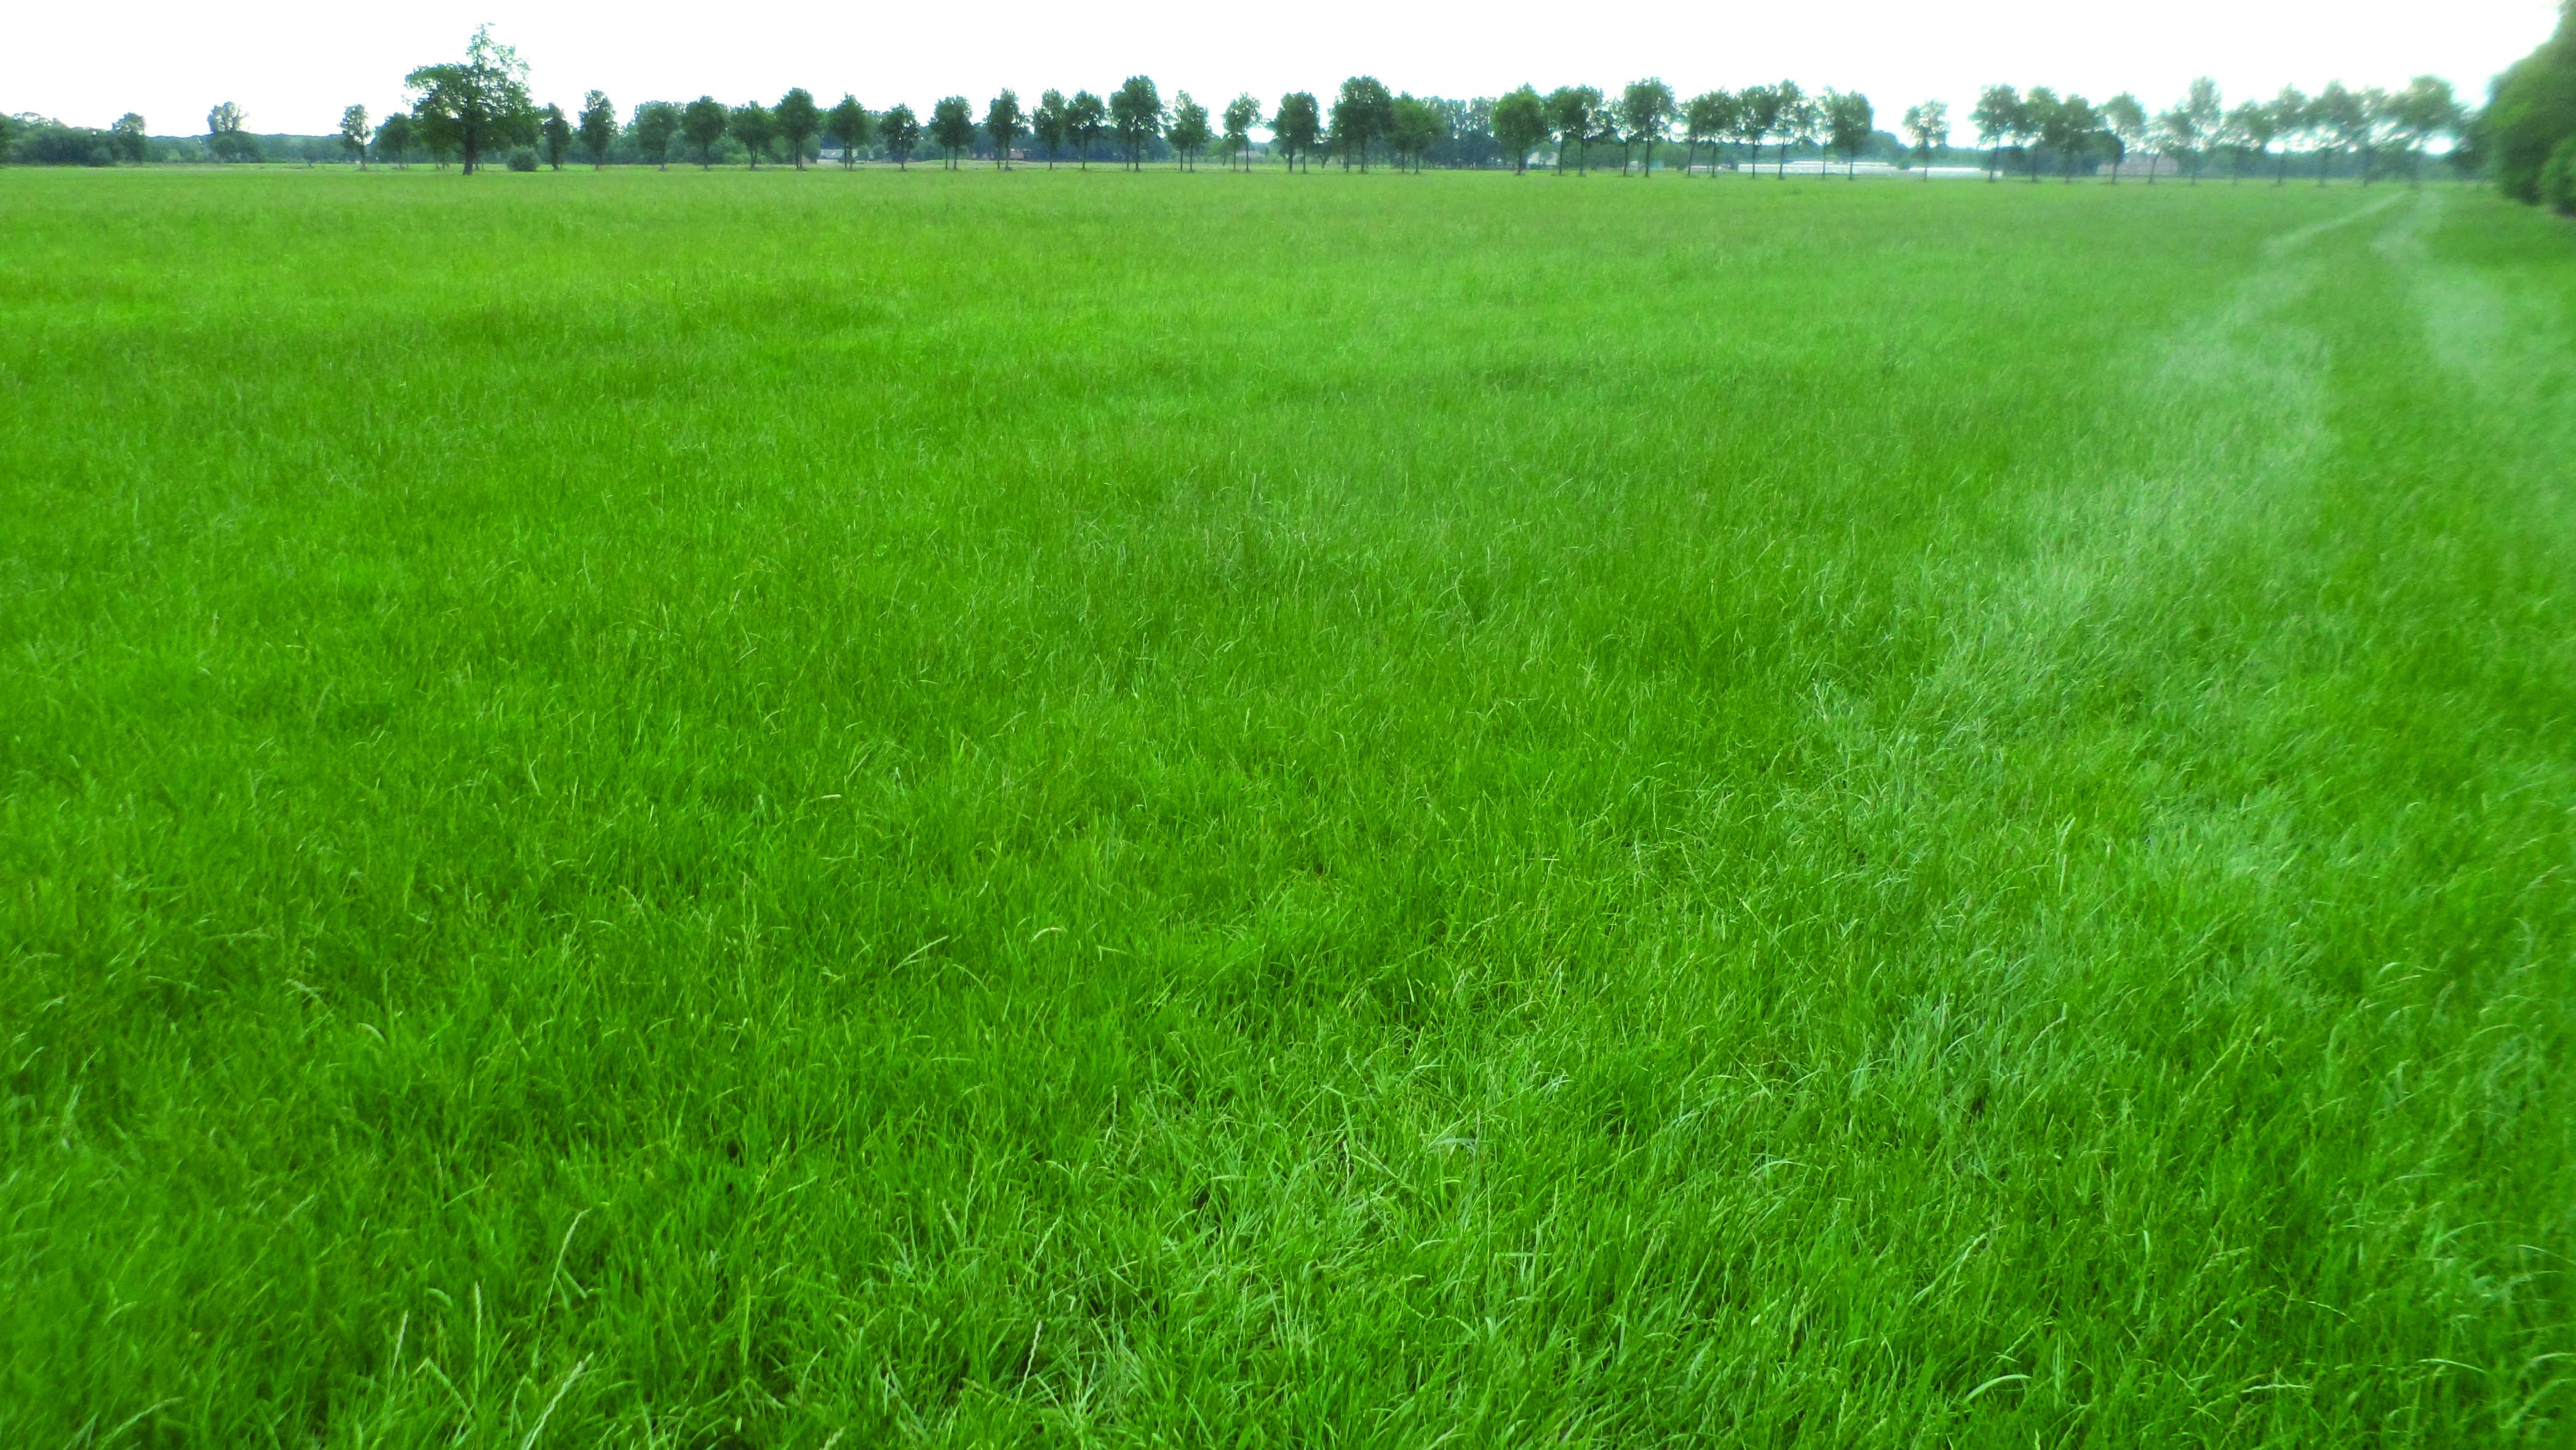 Intensively farmed grassland